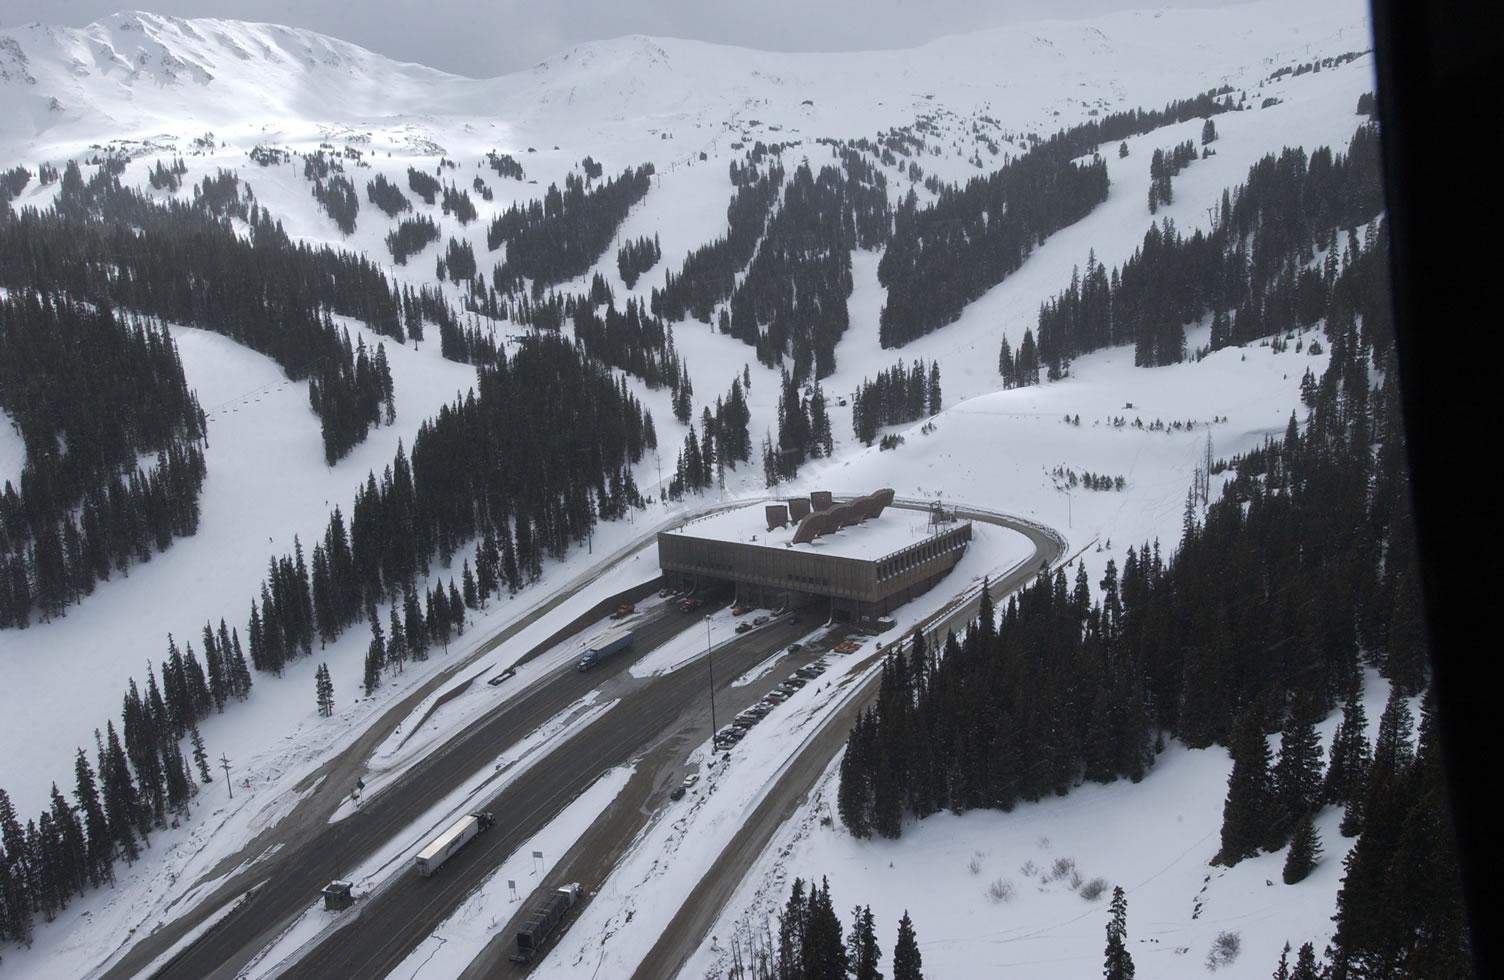 I-70 West Eisenhower Tunnel detail image